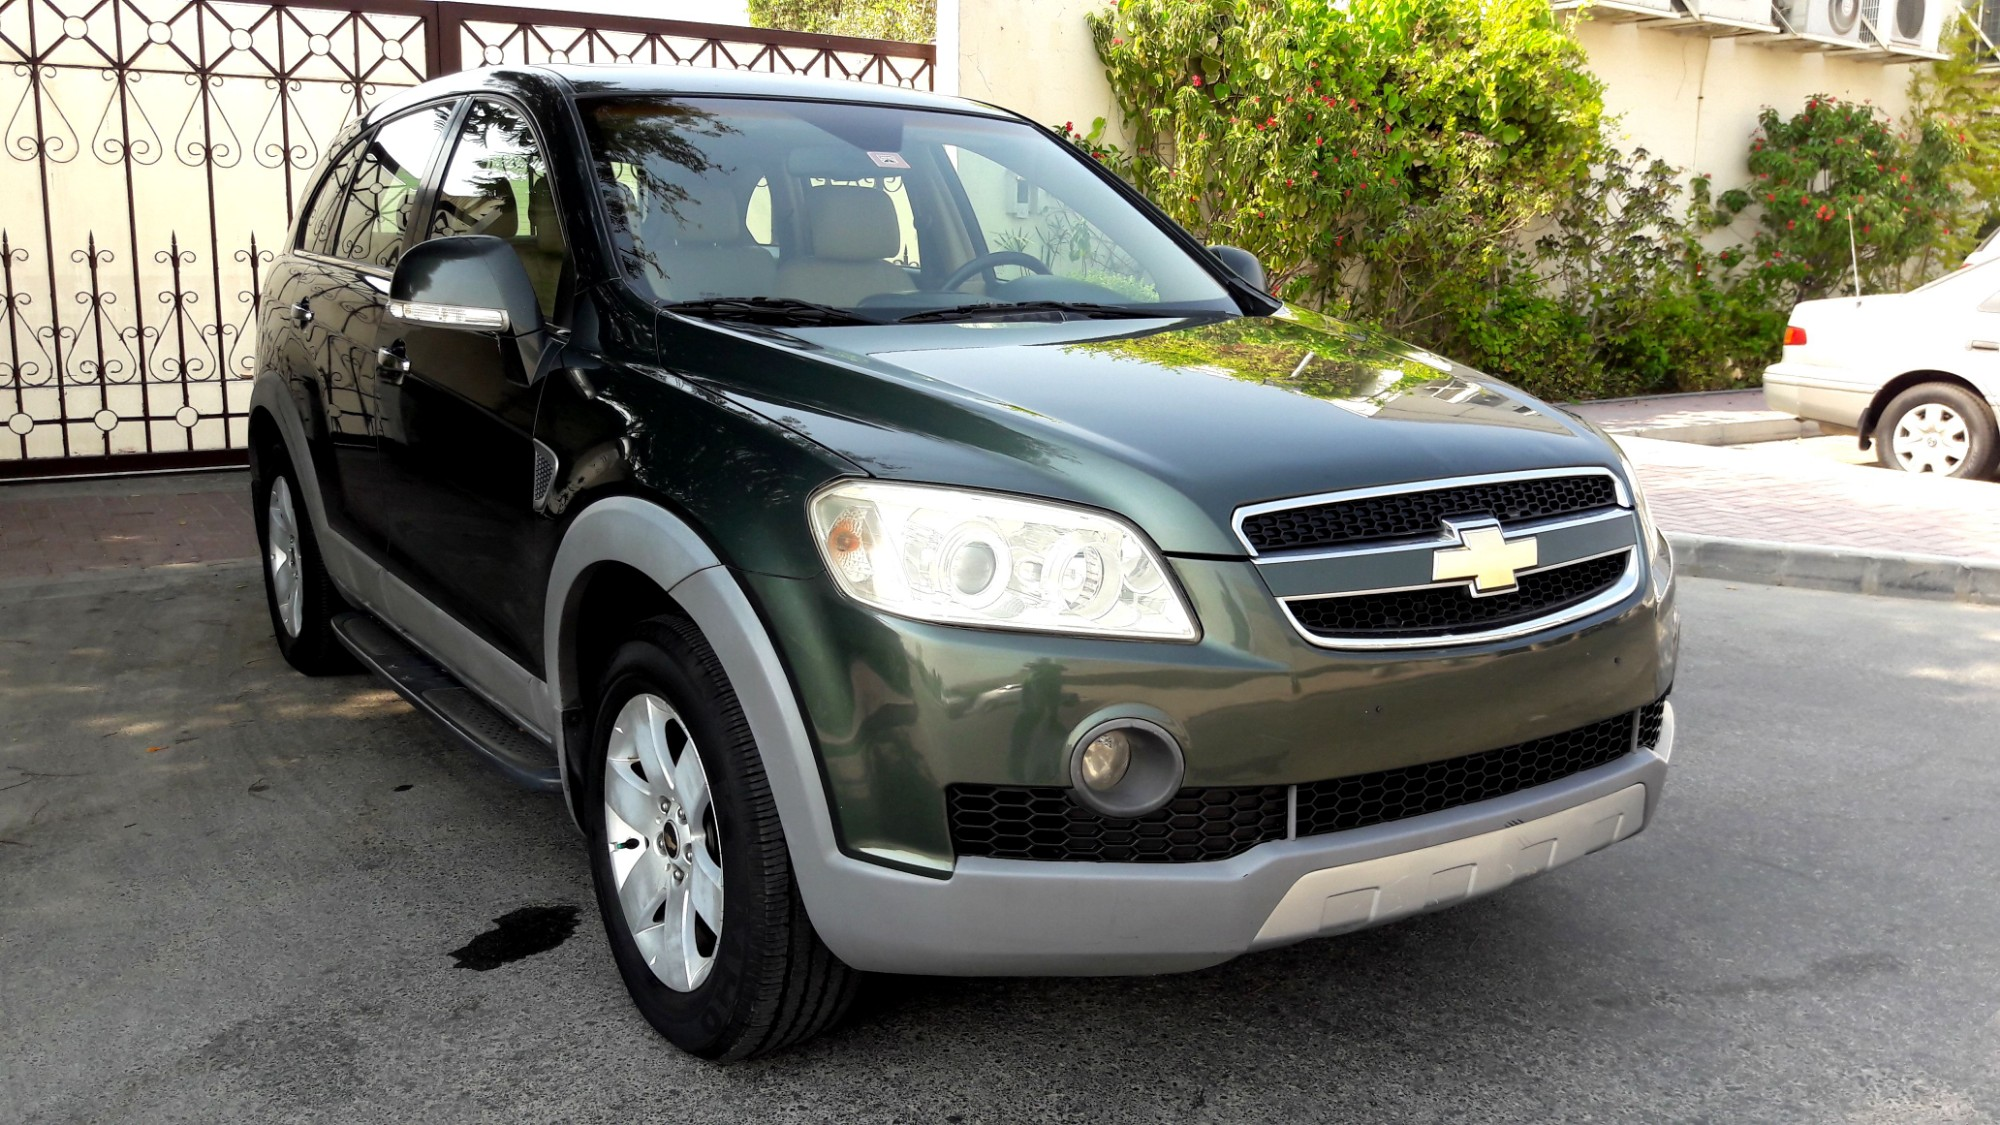 Kekurangan Chevrolet Captiva 2007 Harga